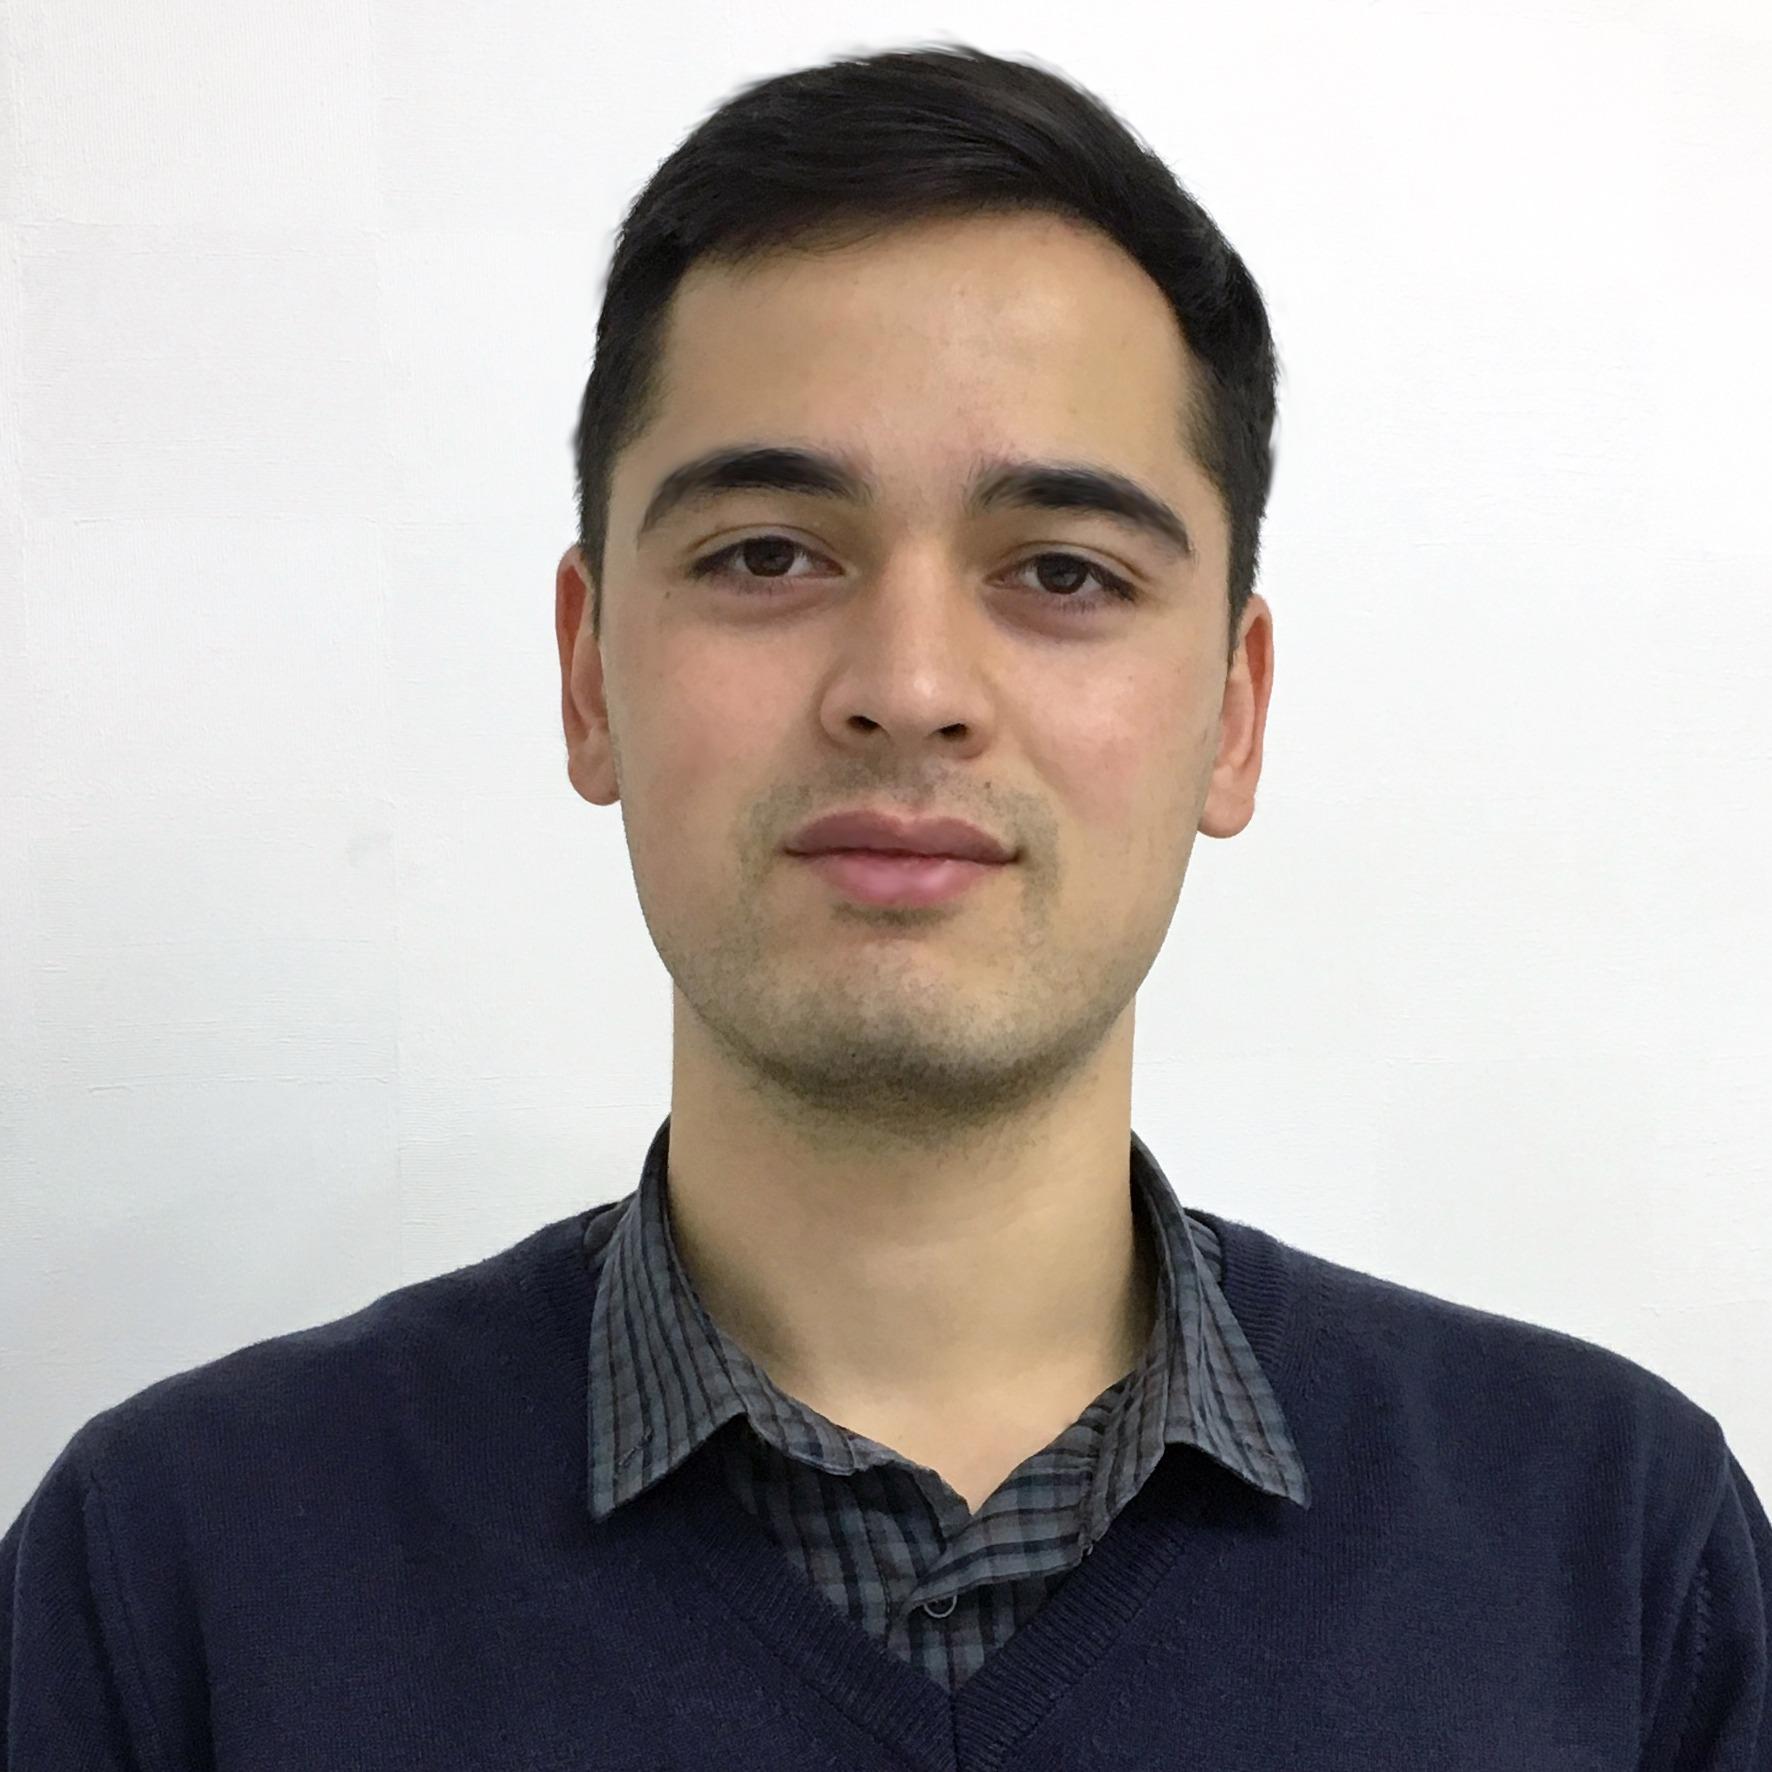 Mekan Babayev